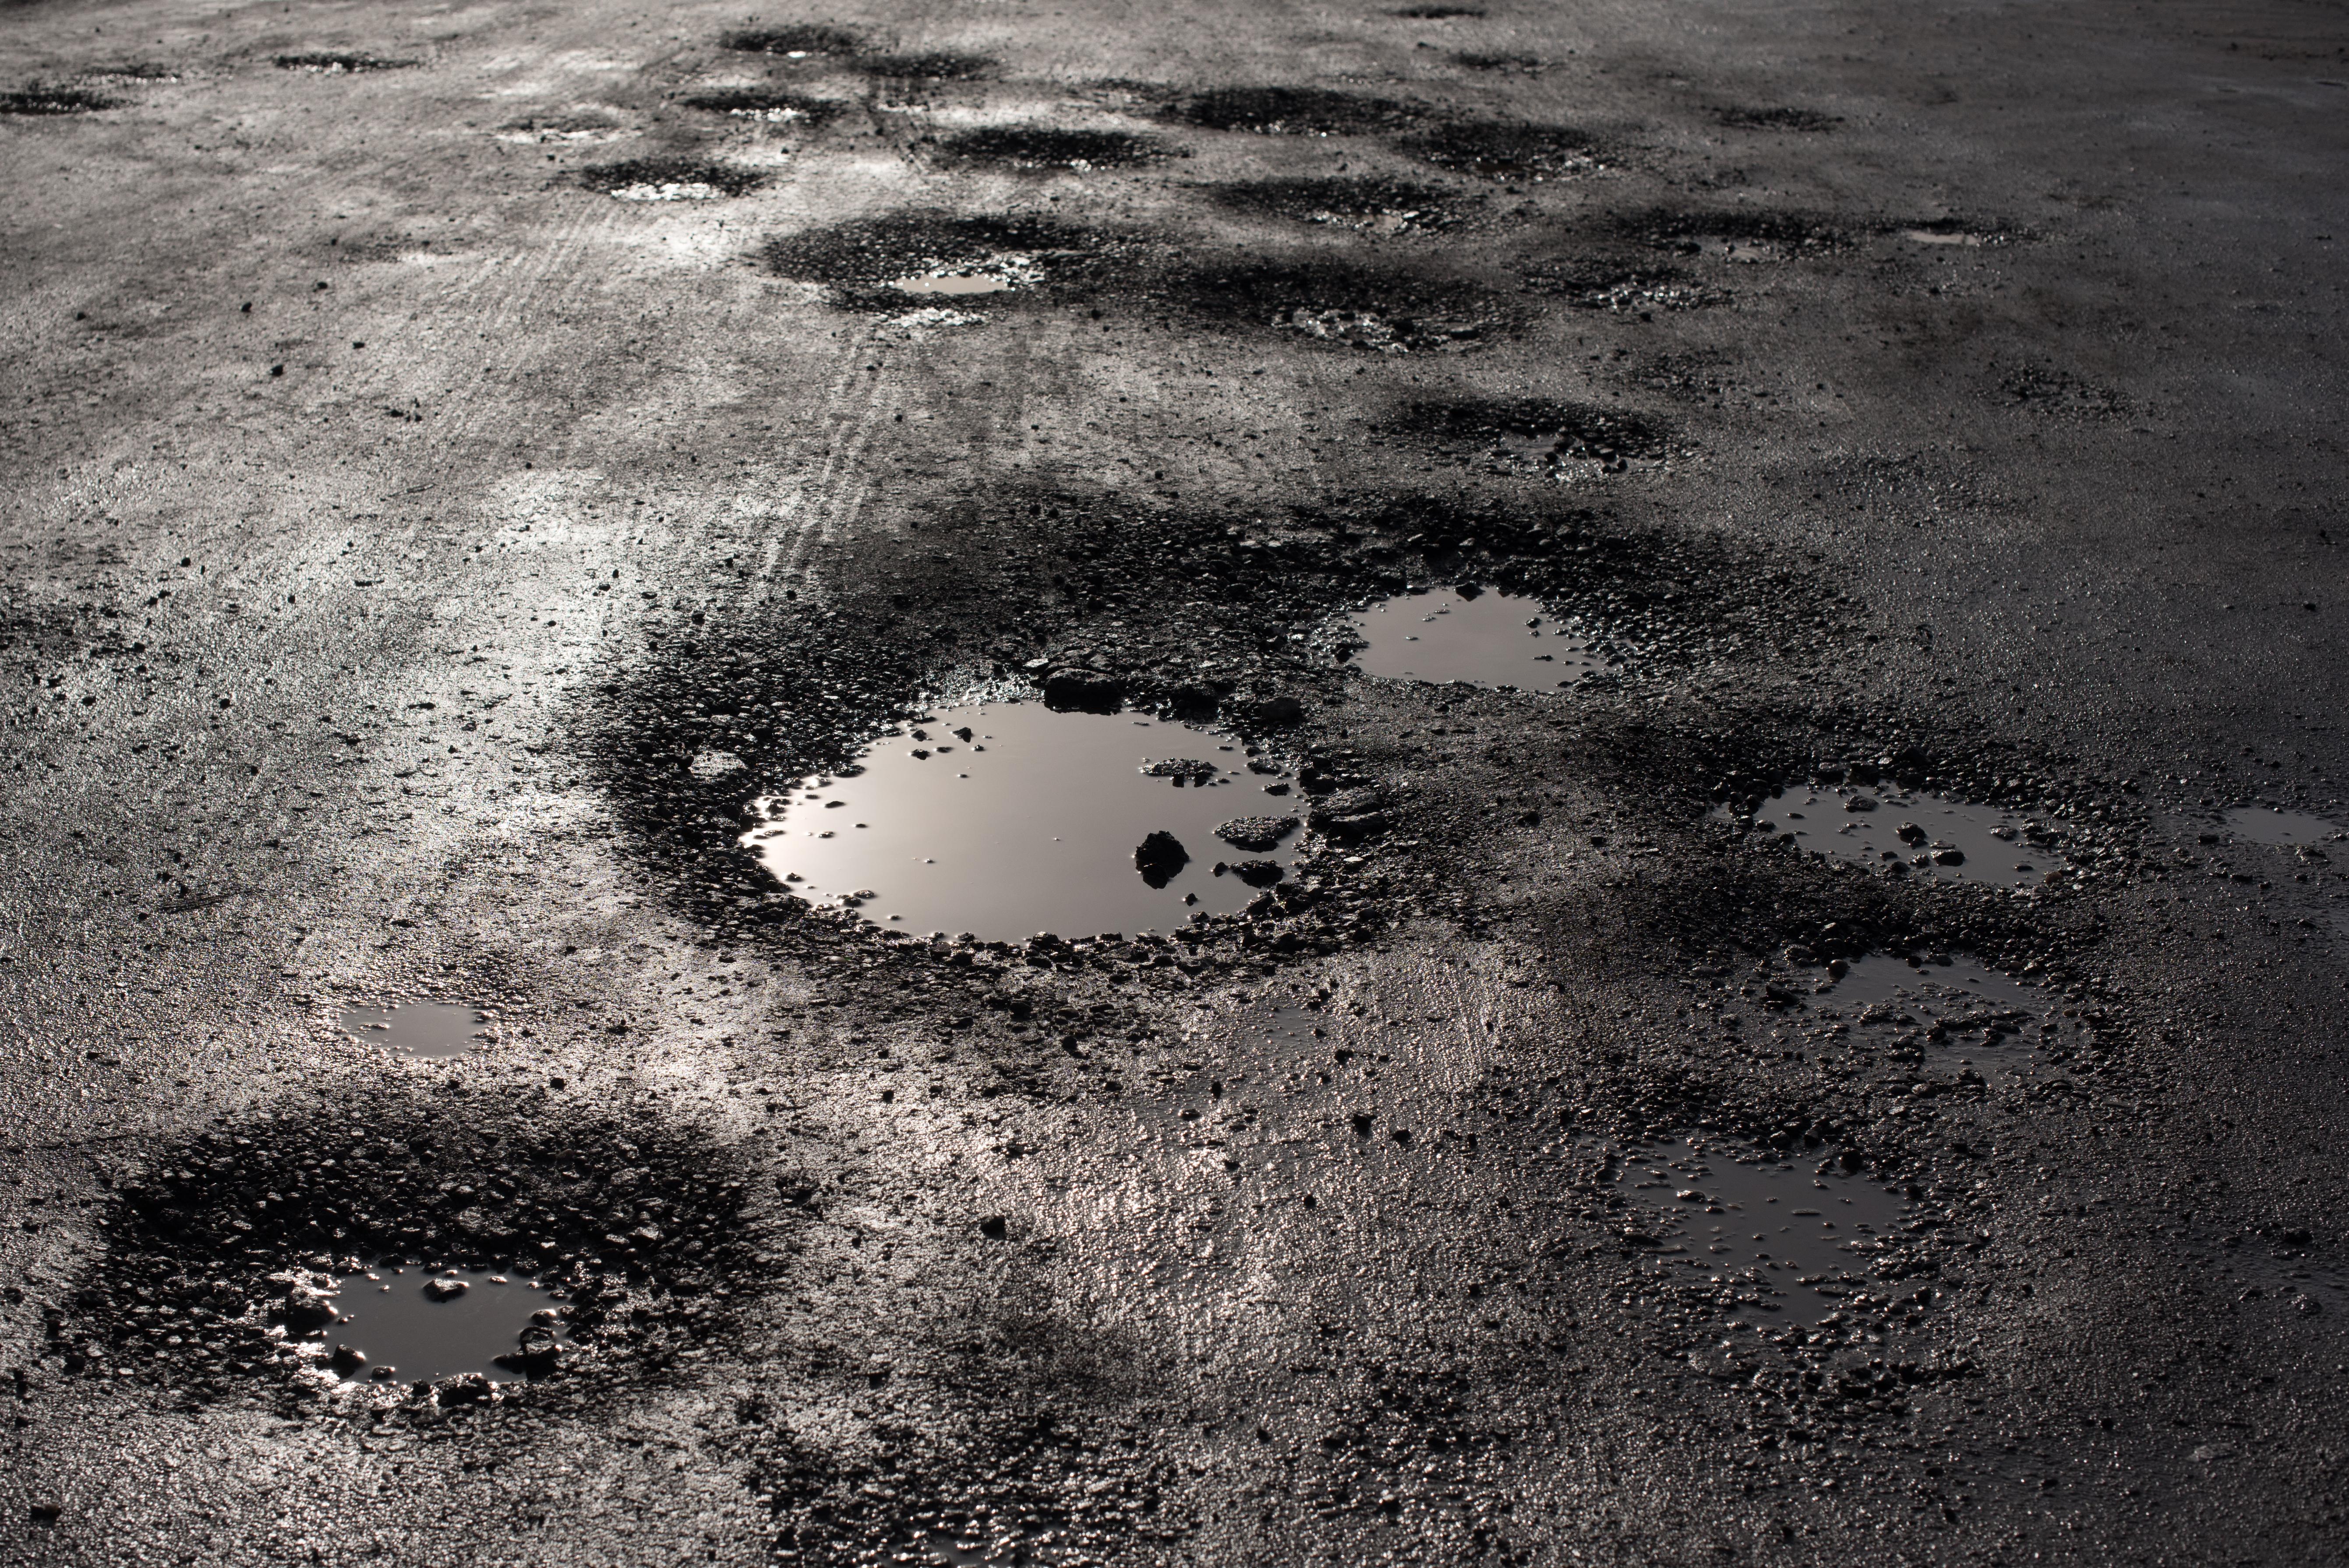 Potholes